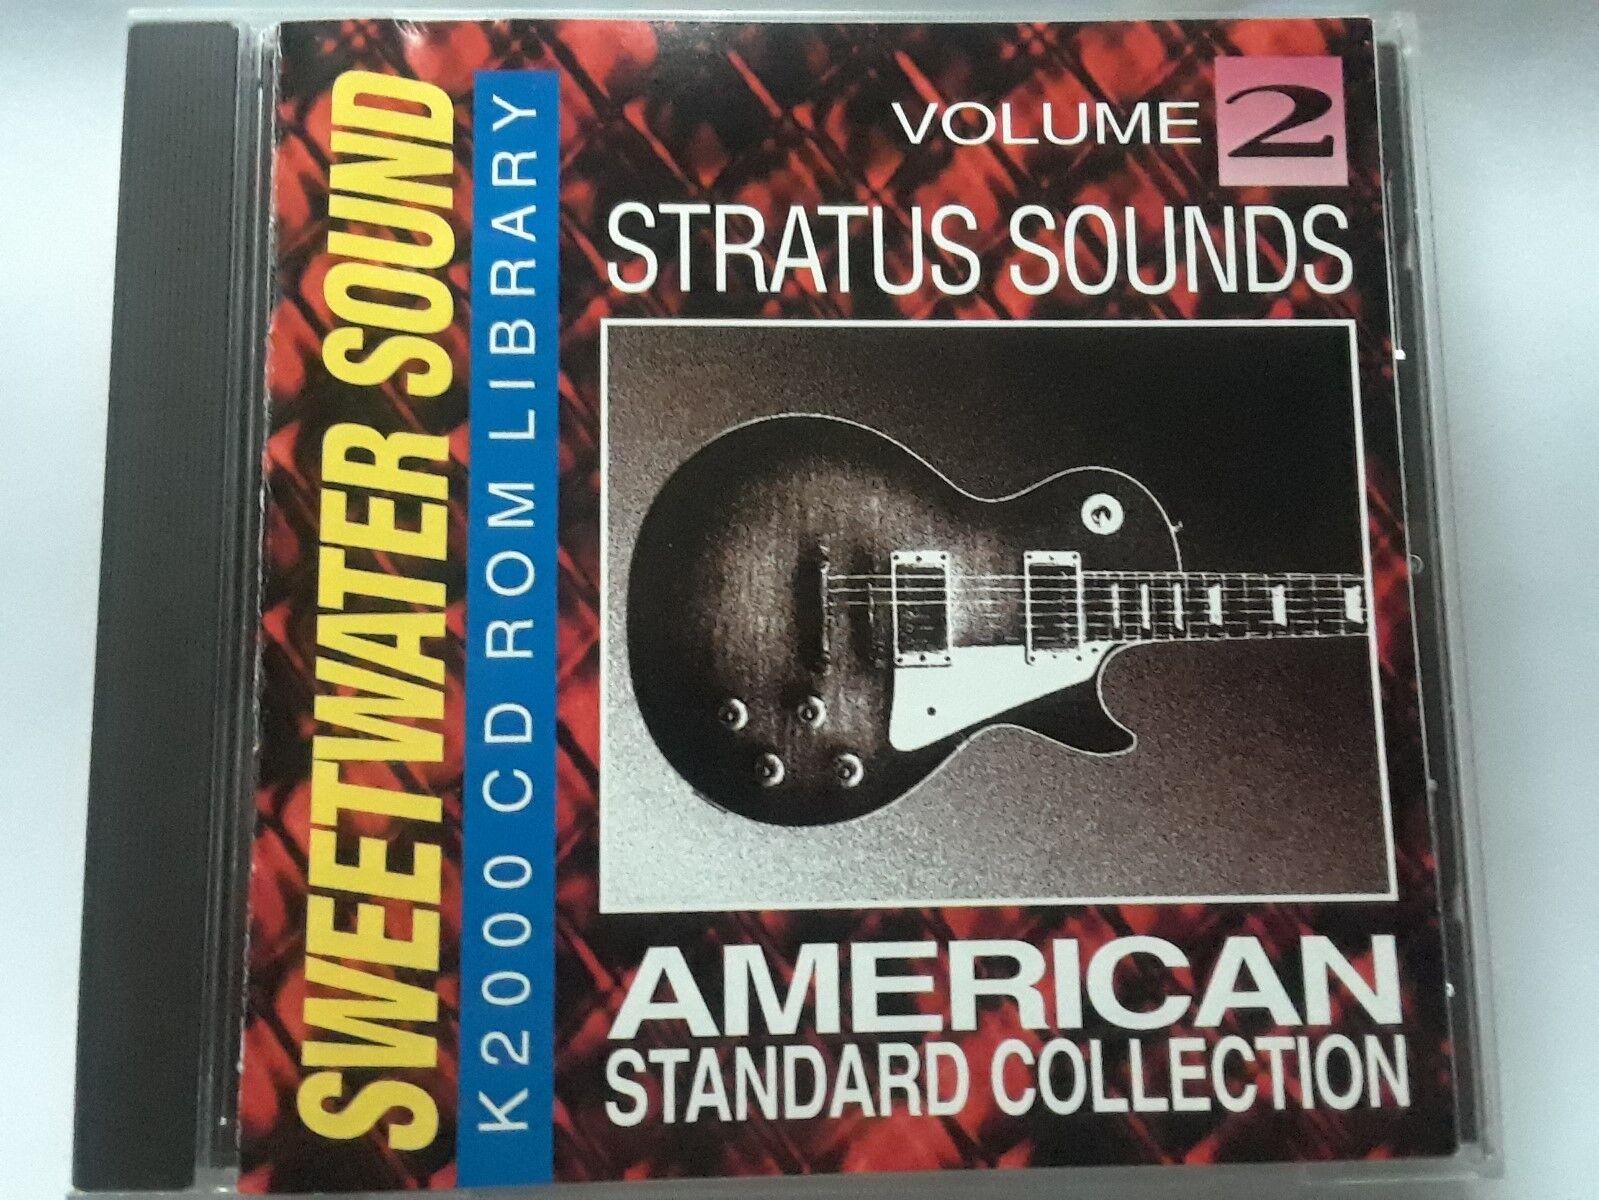 Kurzweil  Sweetwater Sonido  American American American Standard vol.2  Original K2000 CD-ROM   promocionales de incentivo